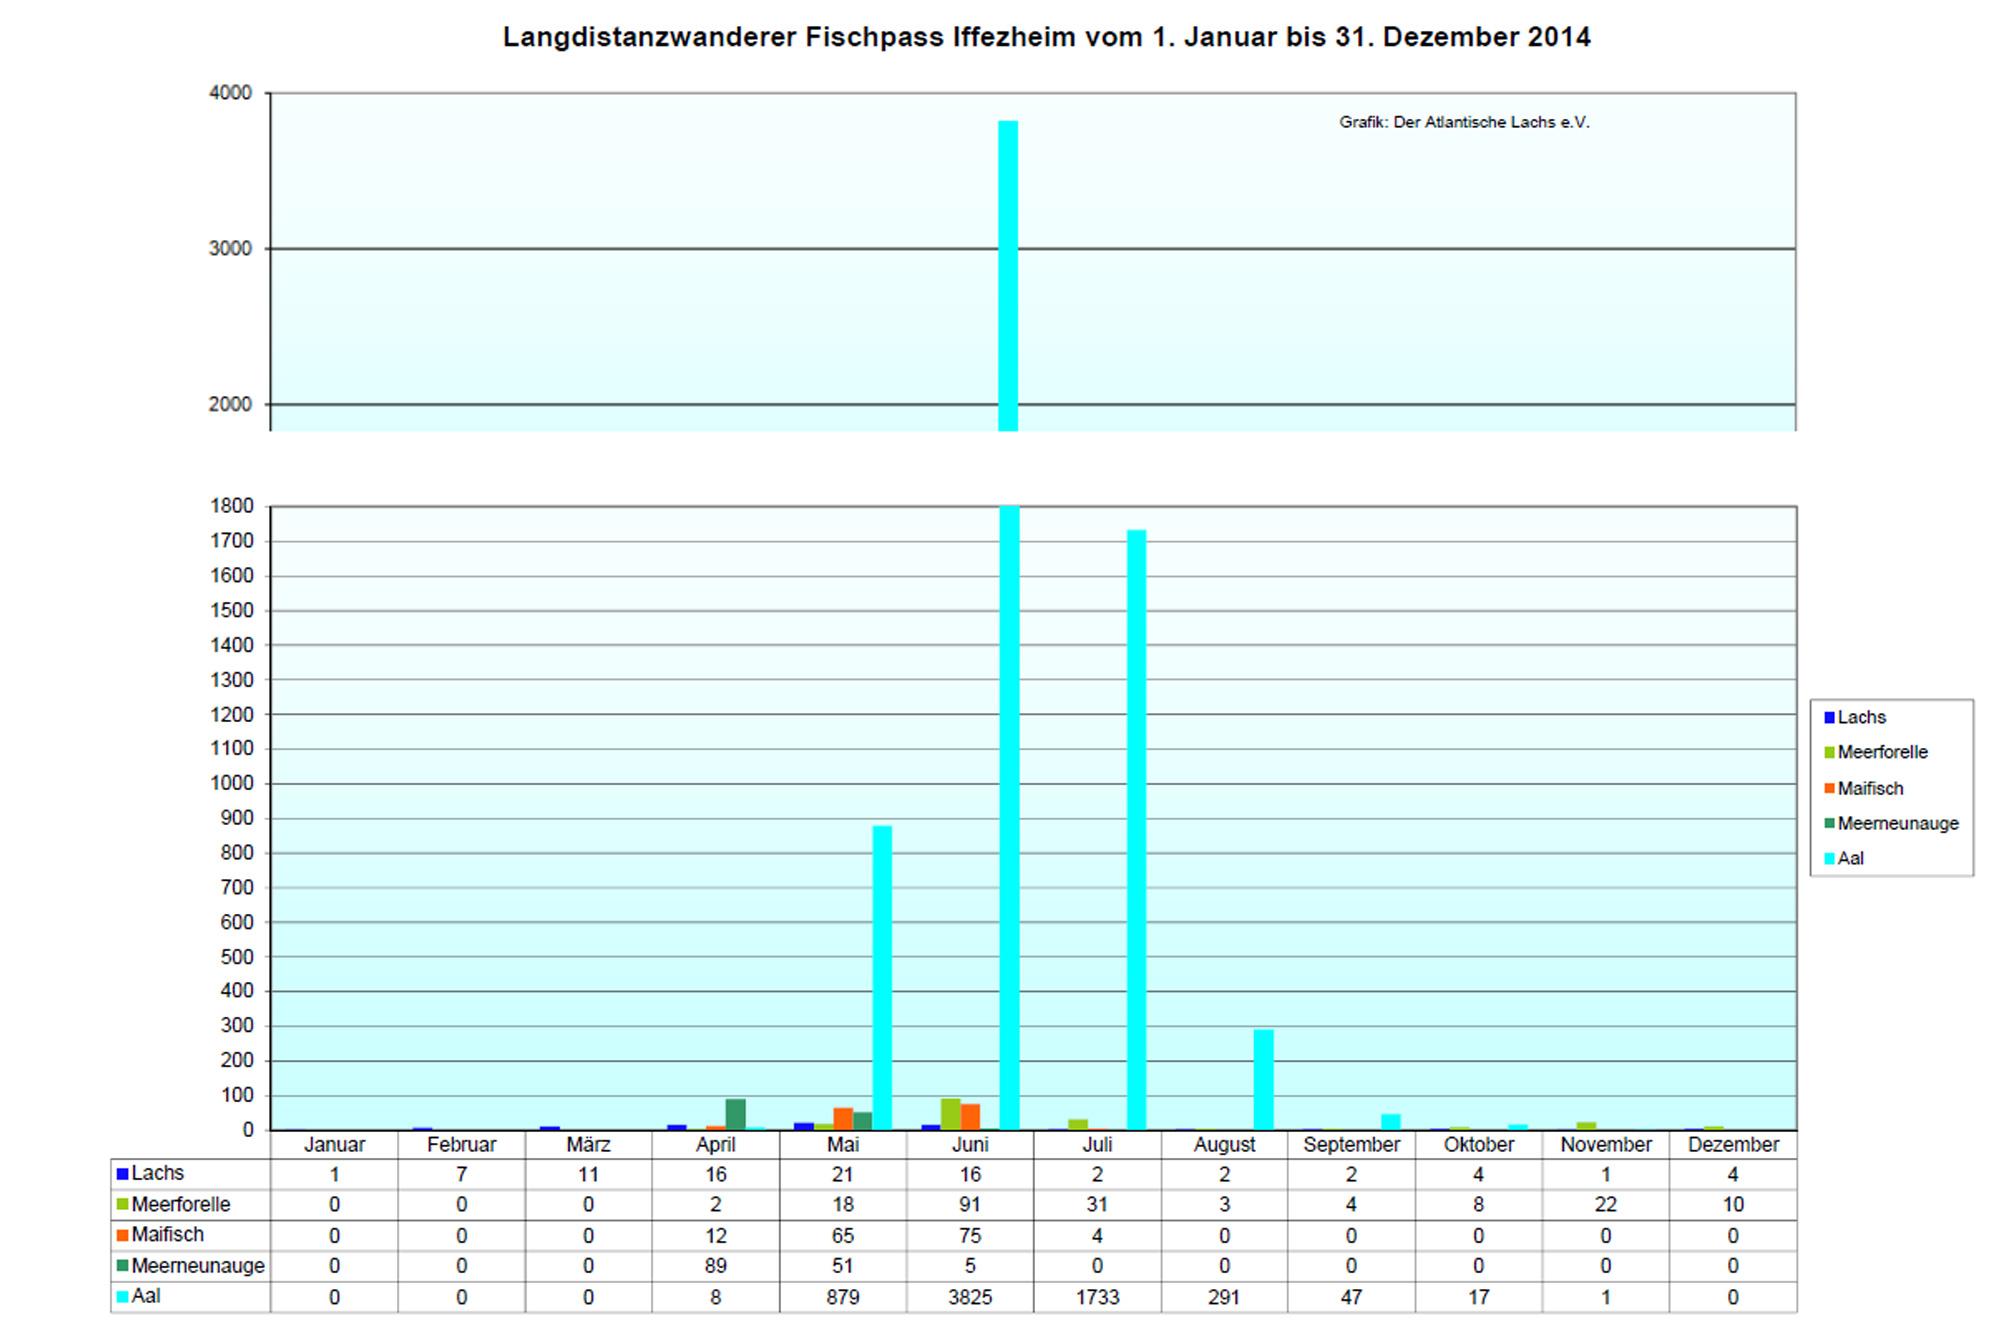 Rückkehrerstatistik Iffezheim 2014